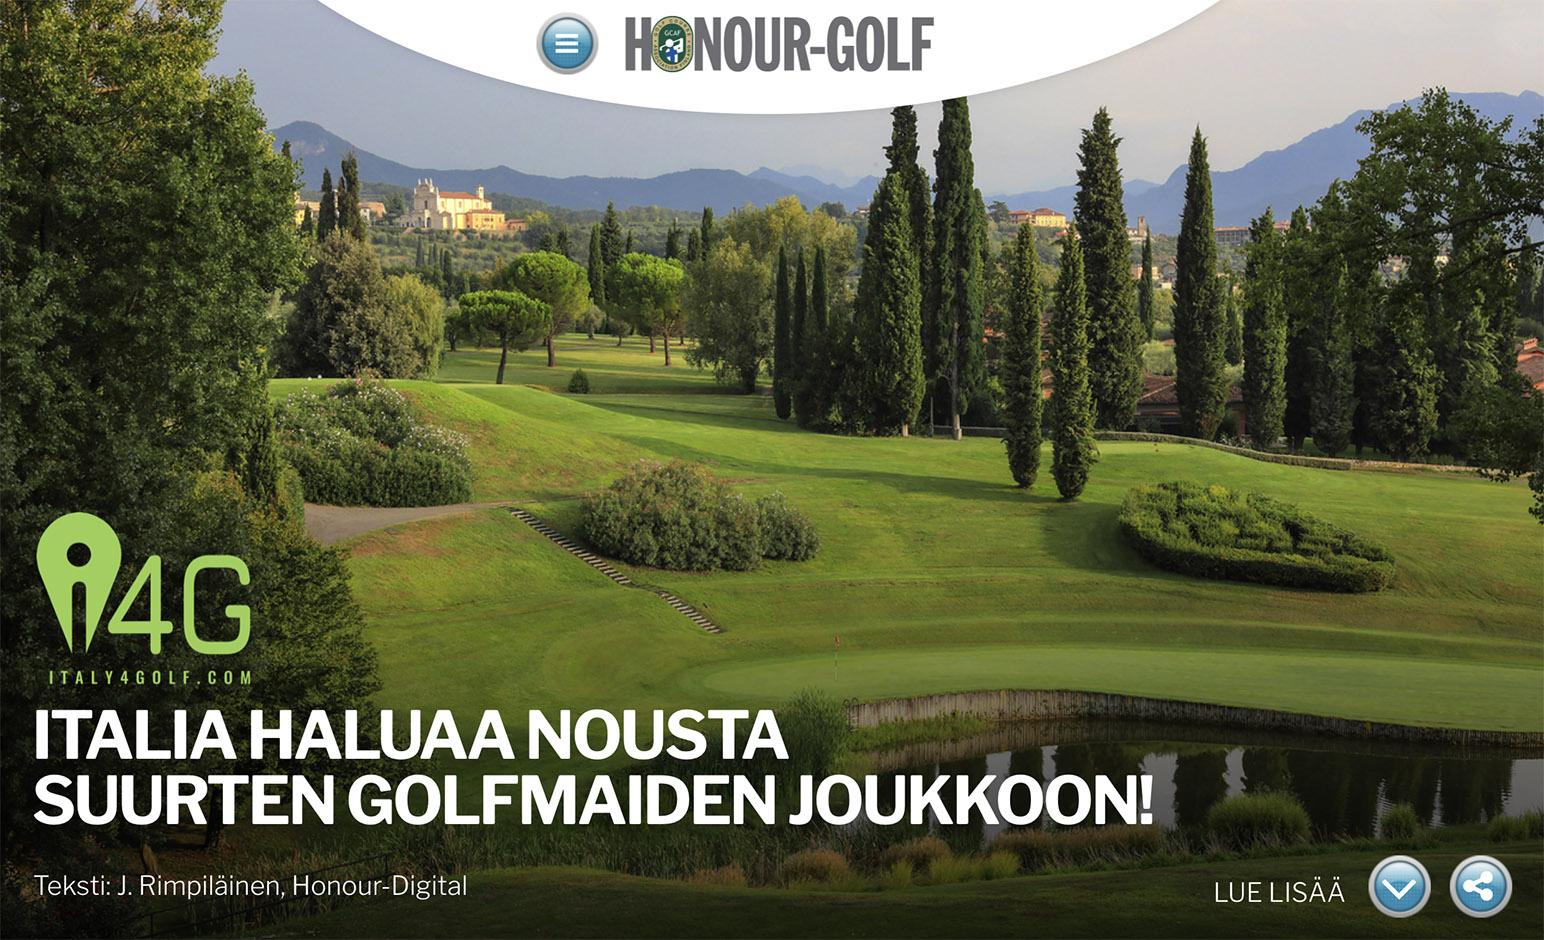 Honour-Golf praises Italy4golf